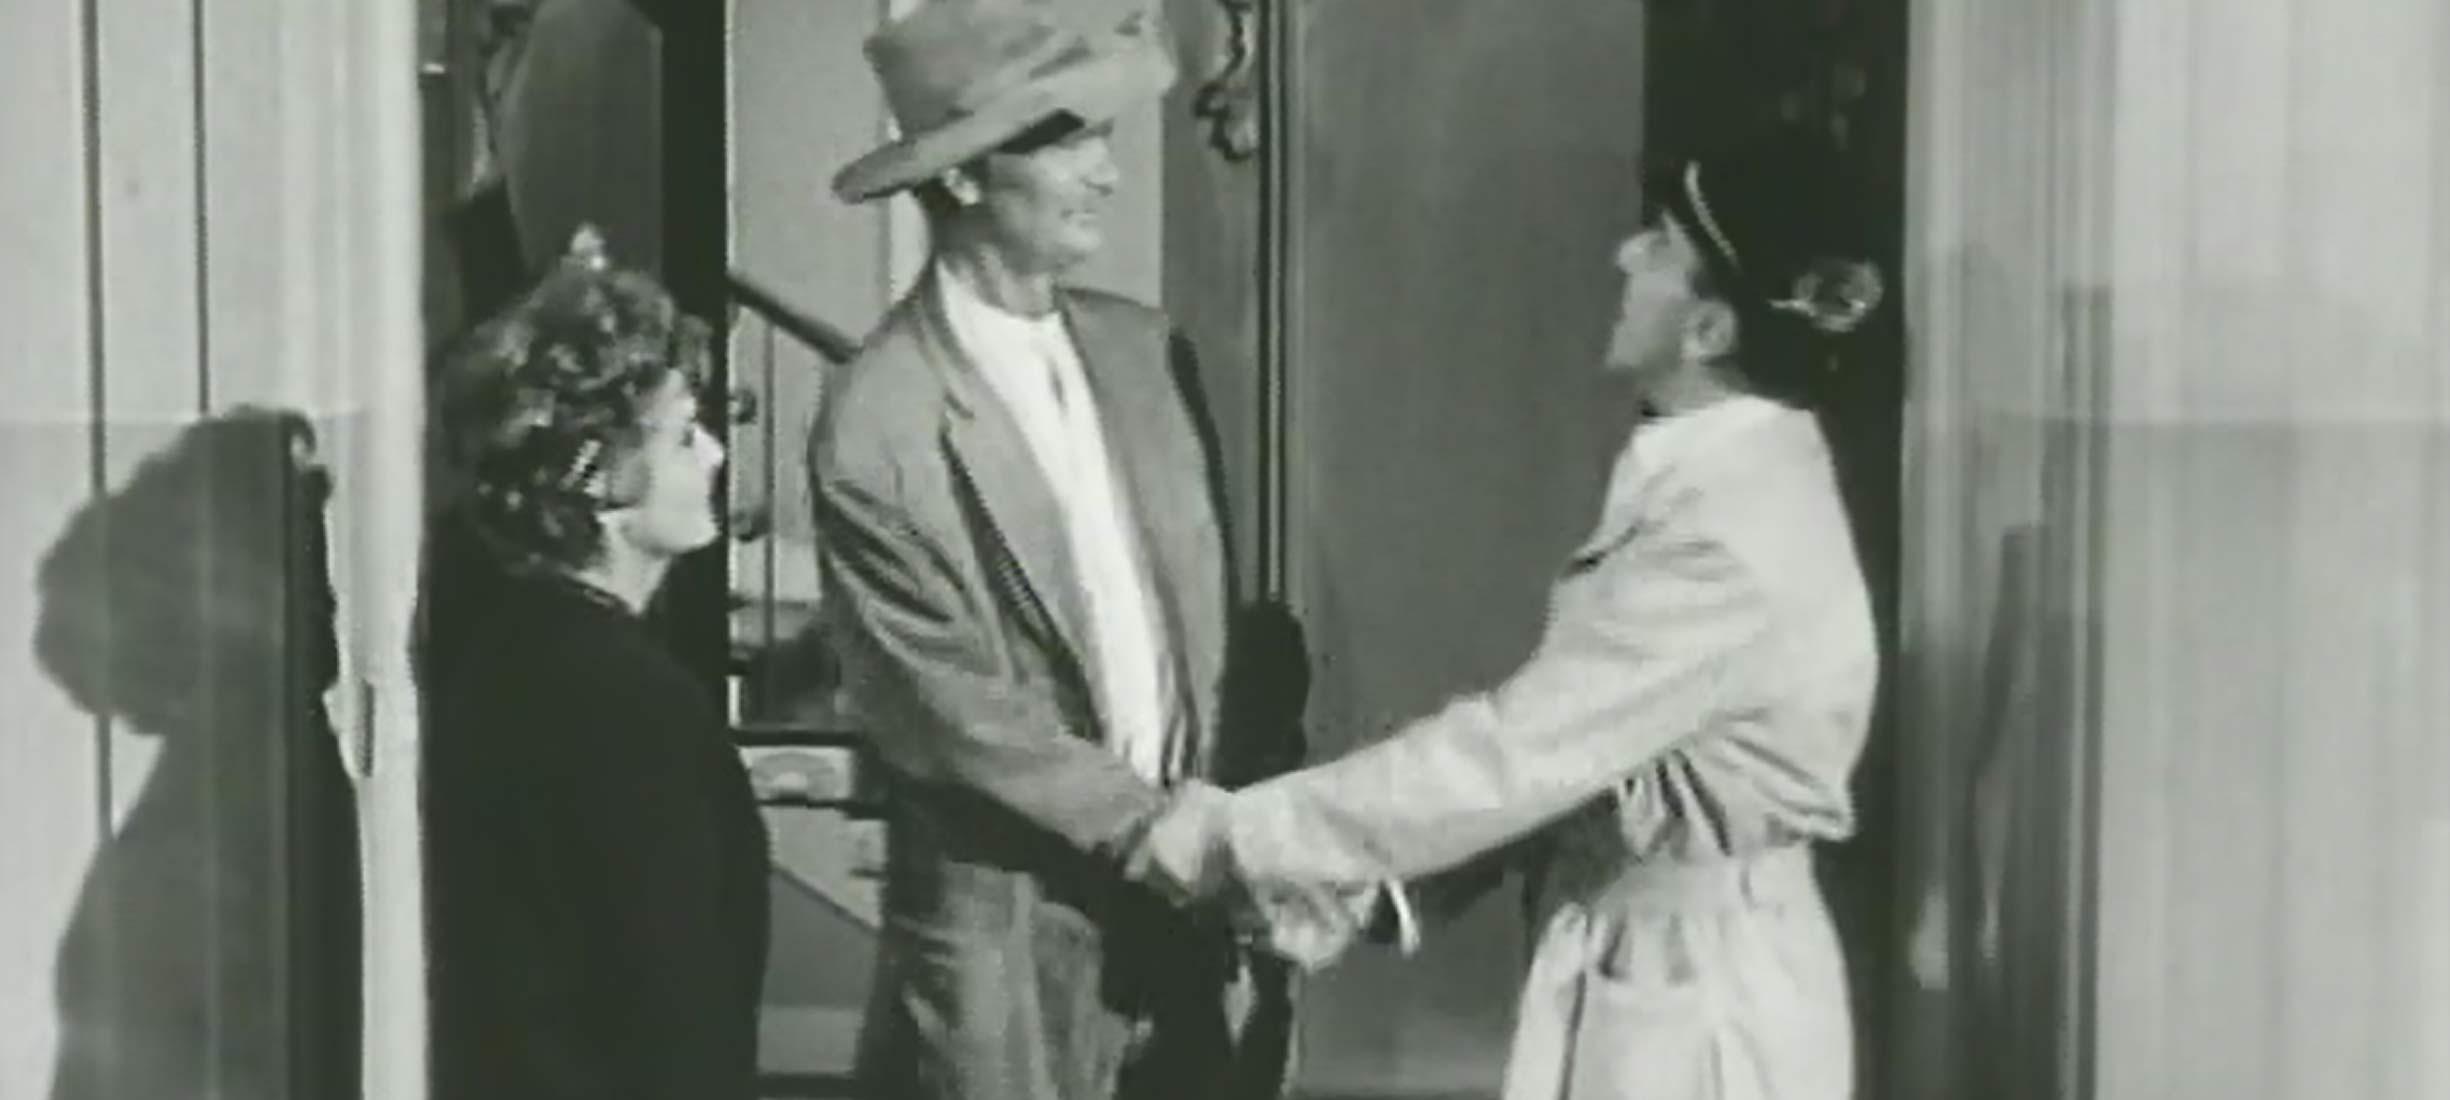 watch classic beverly hillbillies quotclassic beverly